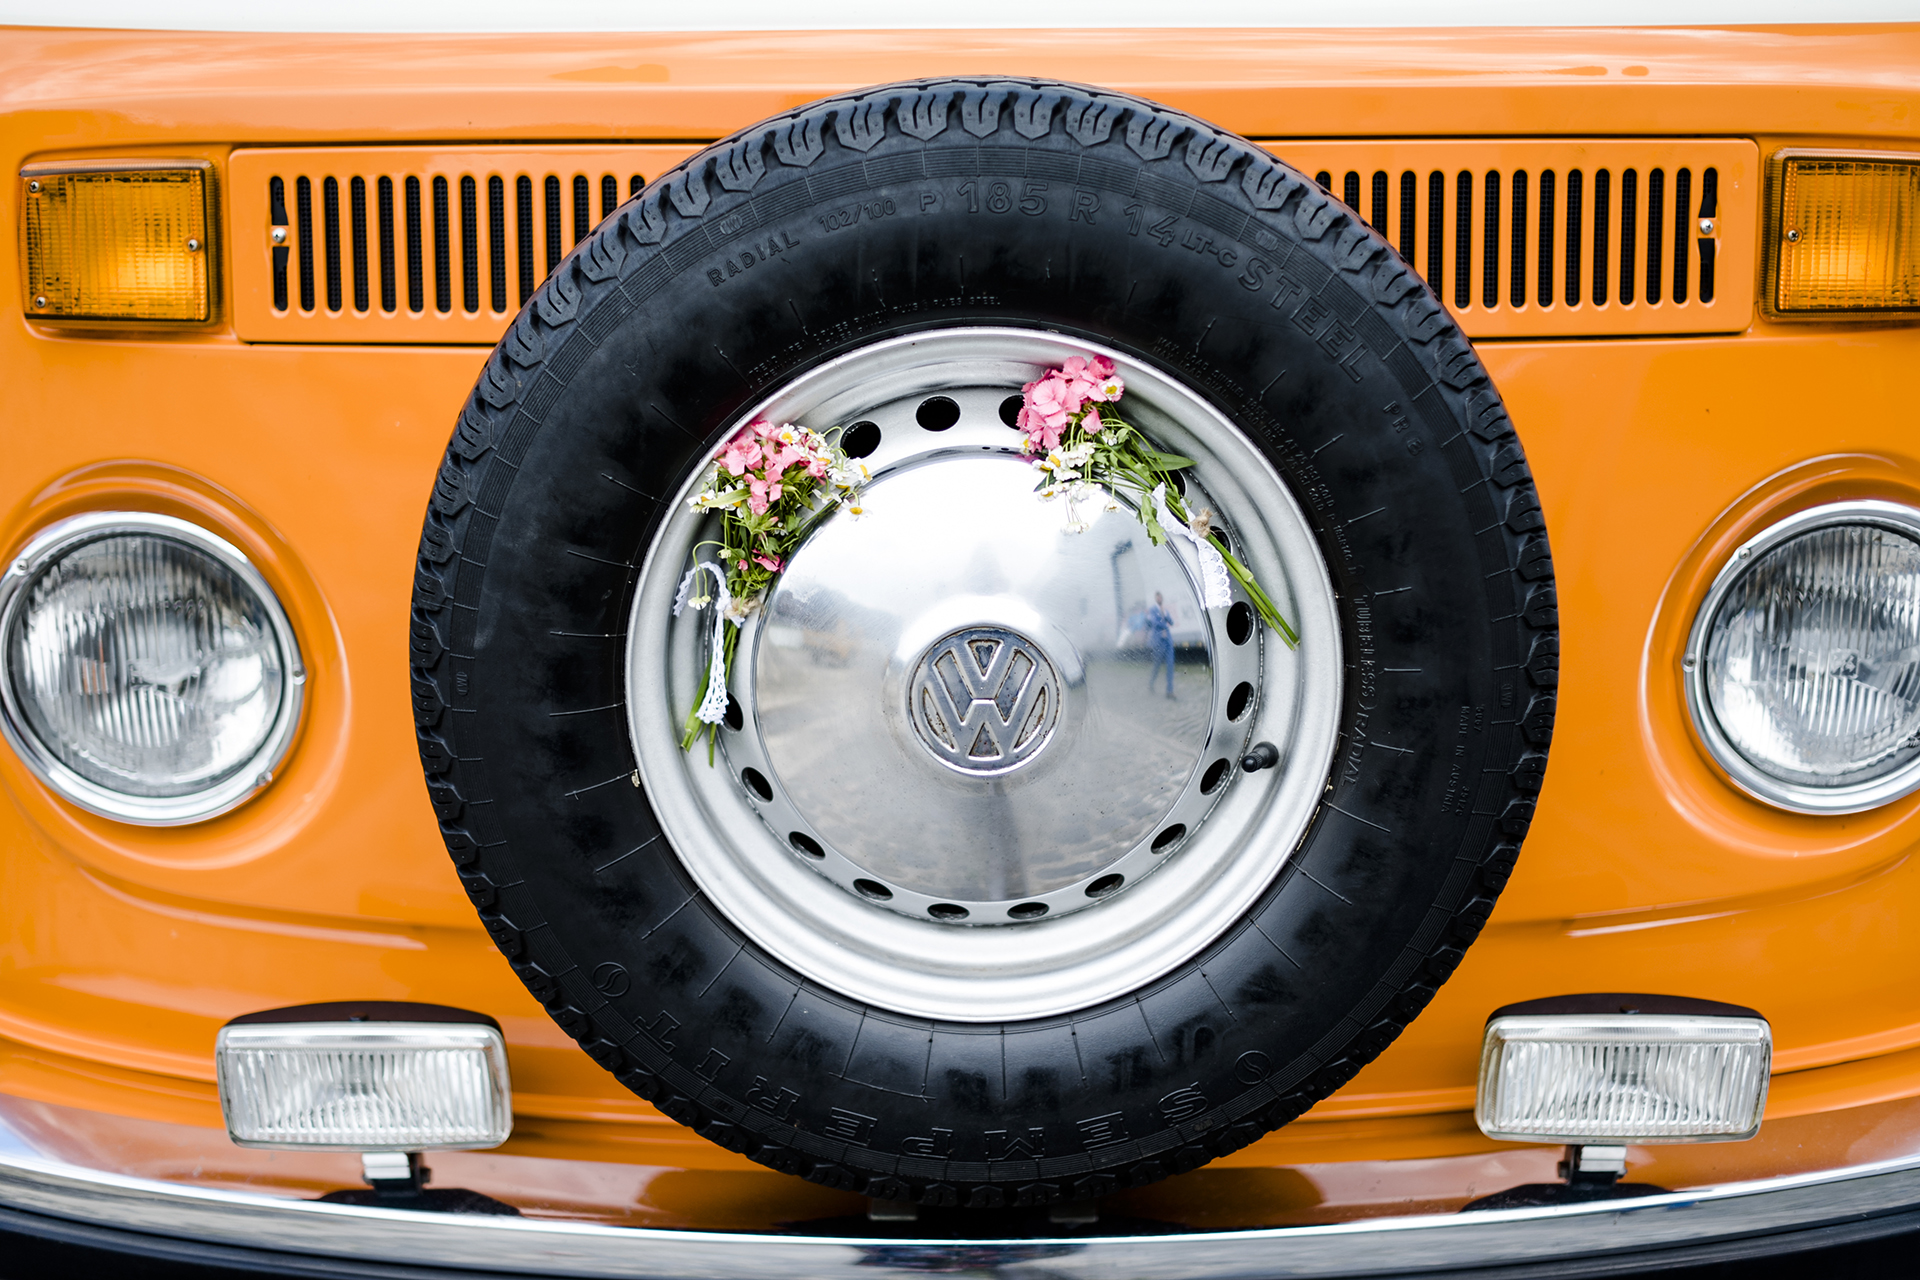 blog_steffimicha_caroline-queda-fotografie70_caroline-queda-fotografie